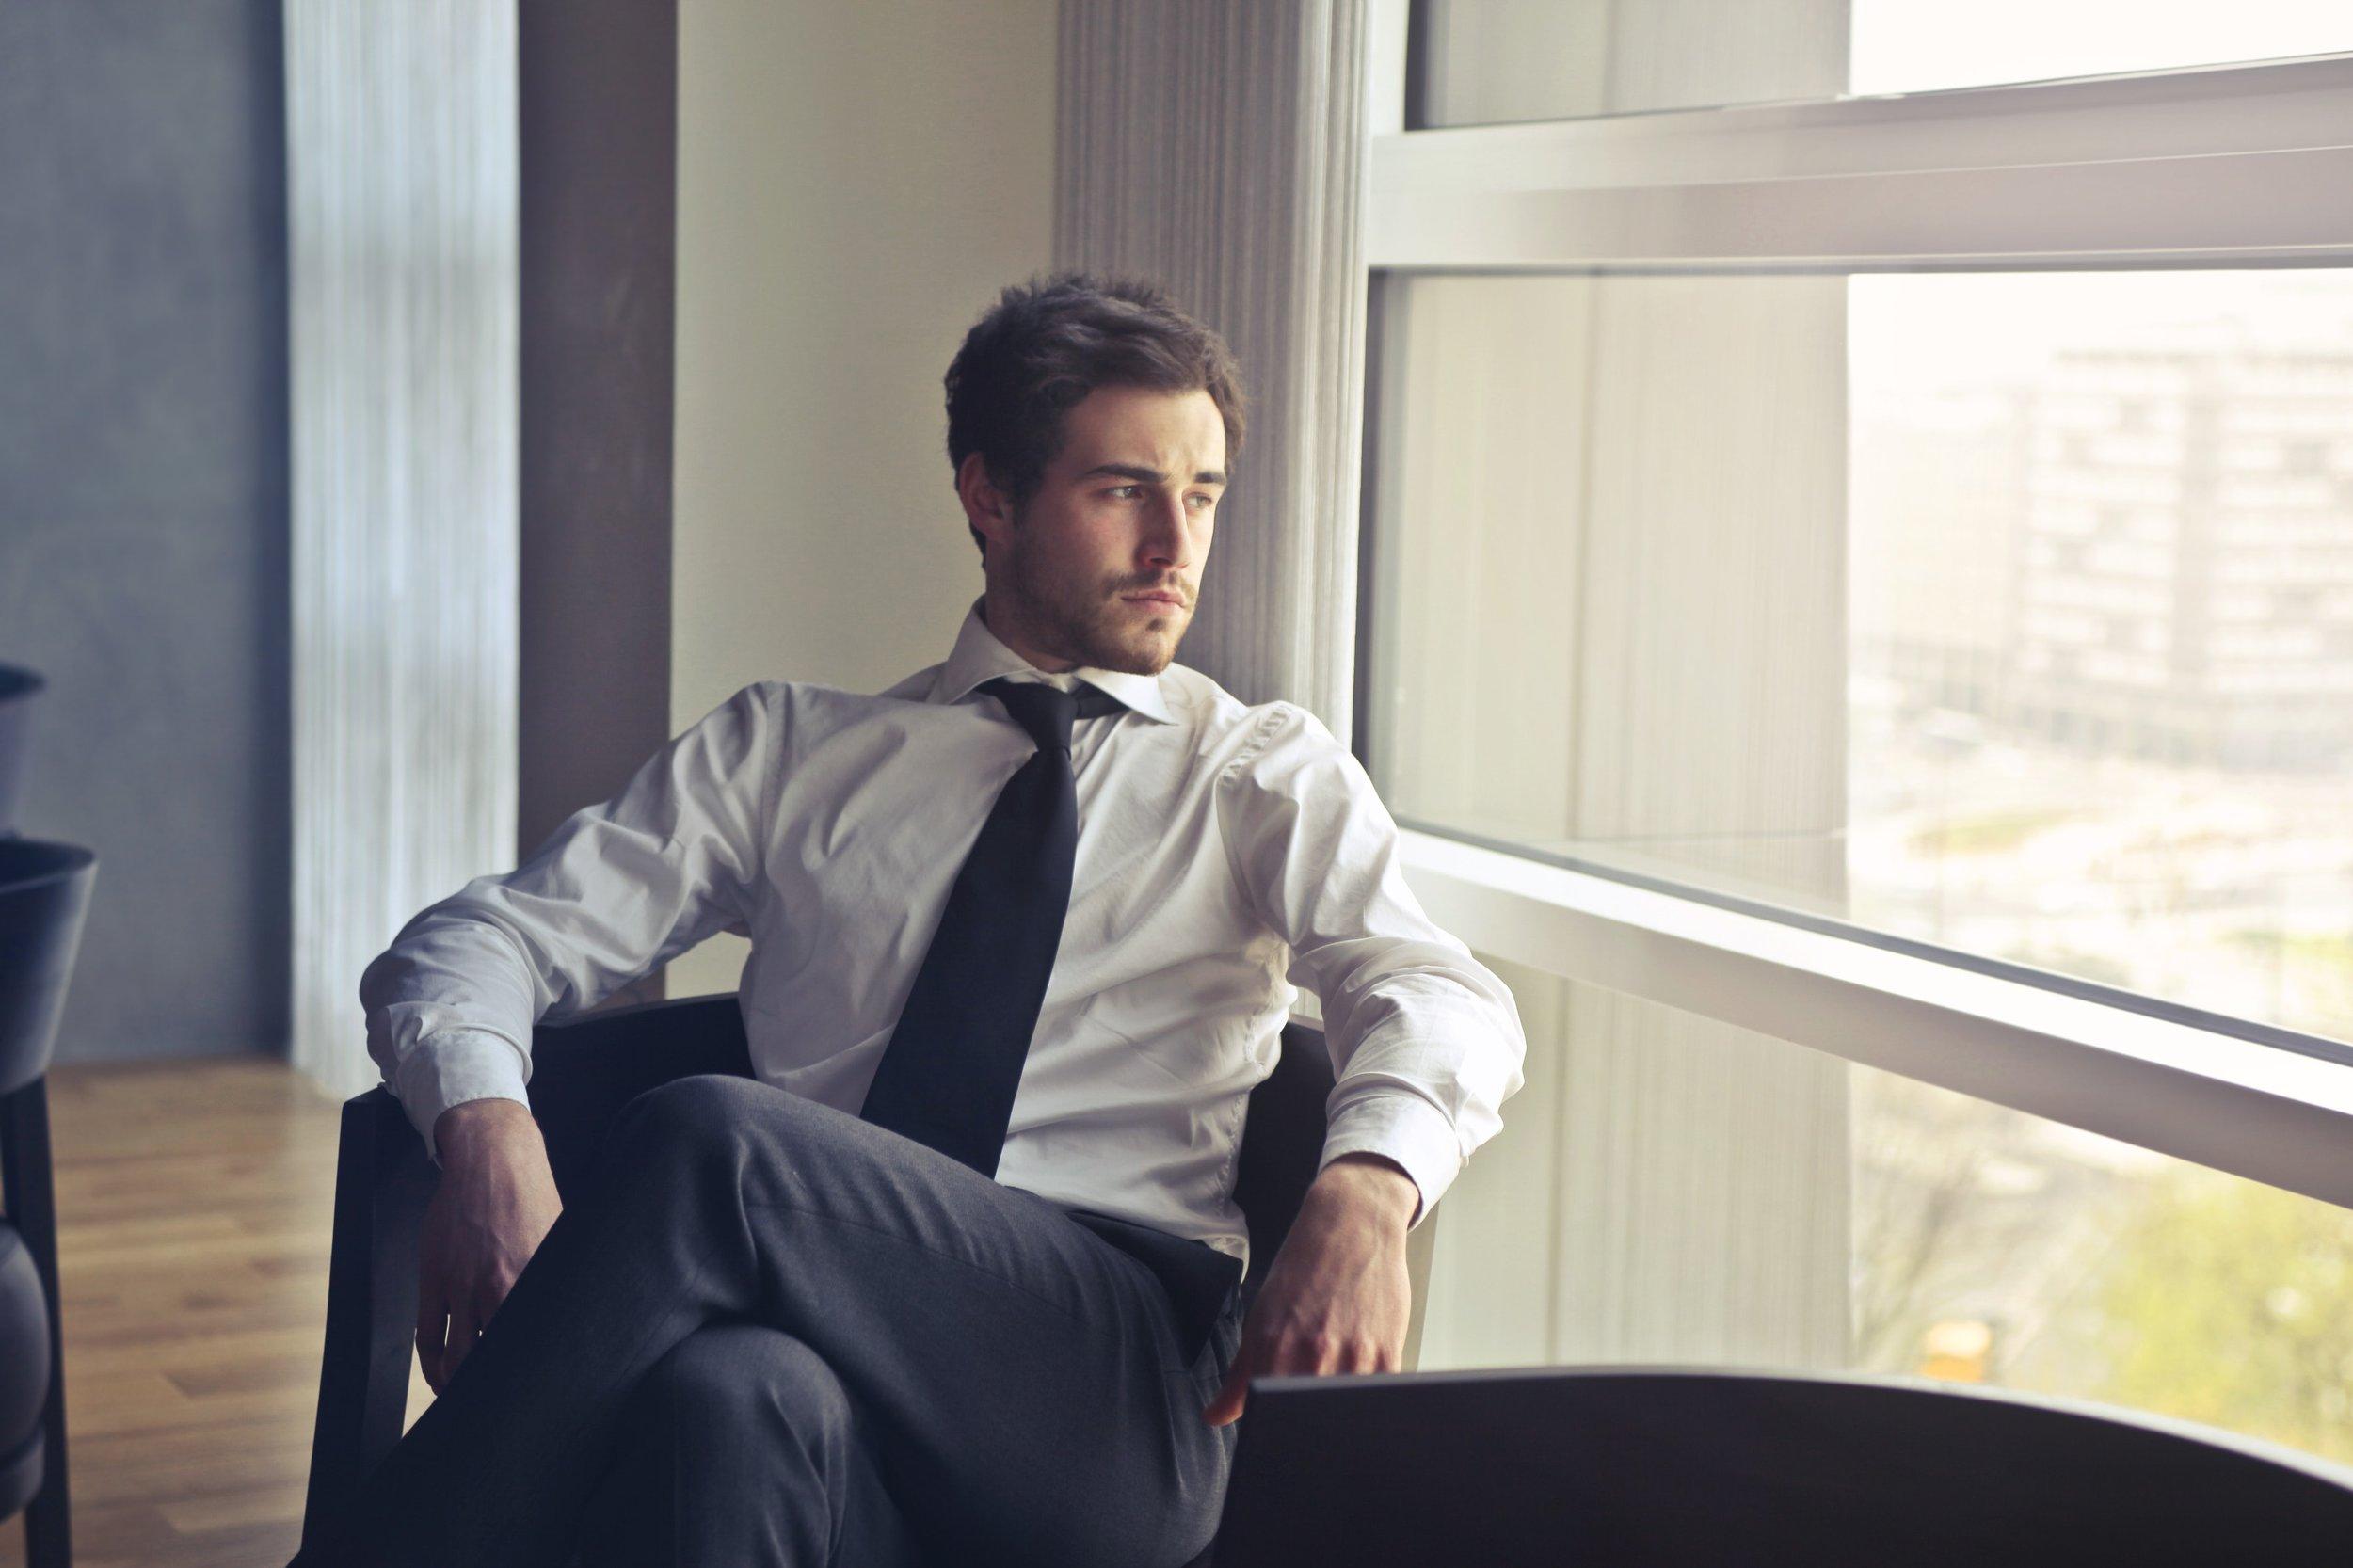 businessman-chairs-facial-expression-716411.jpg